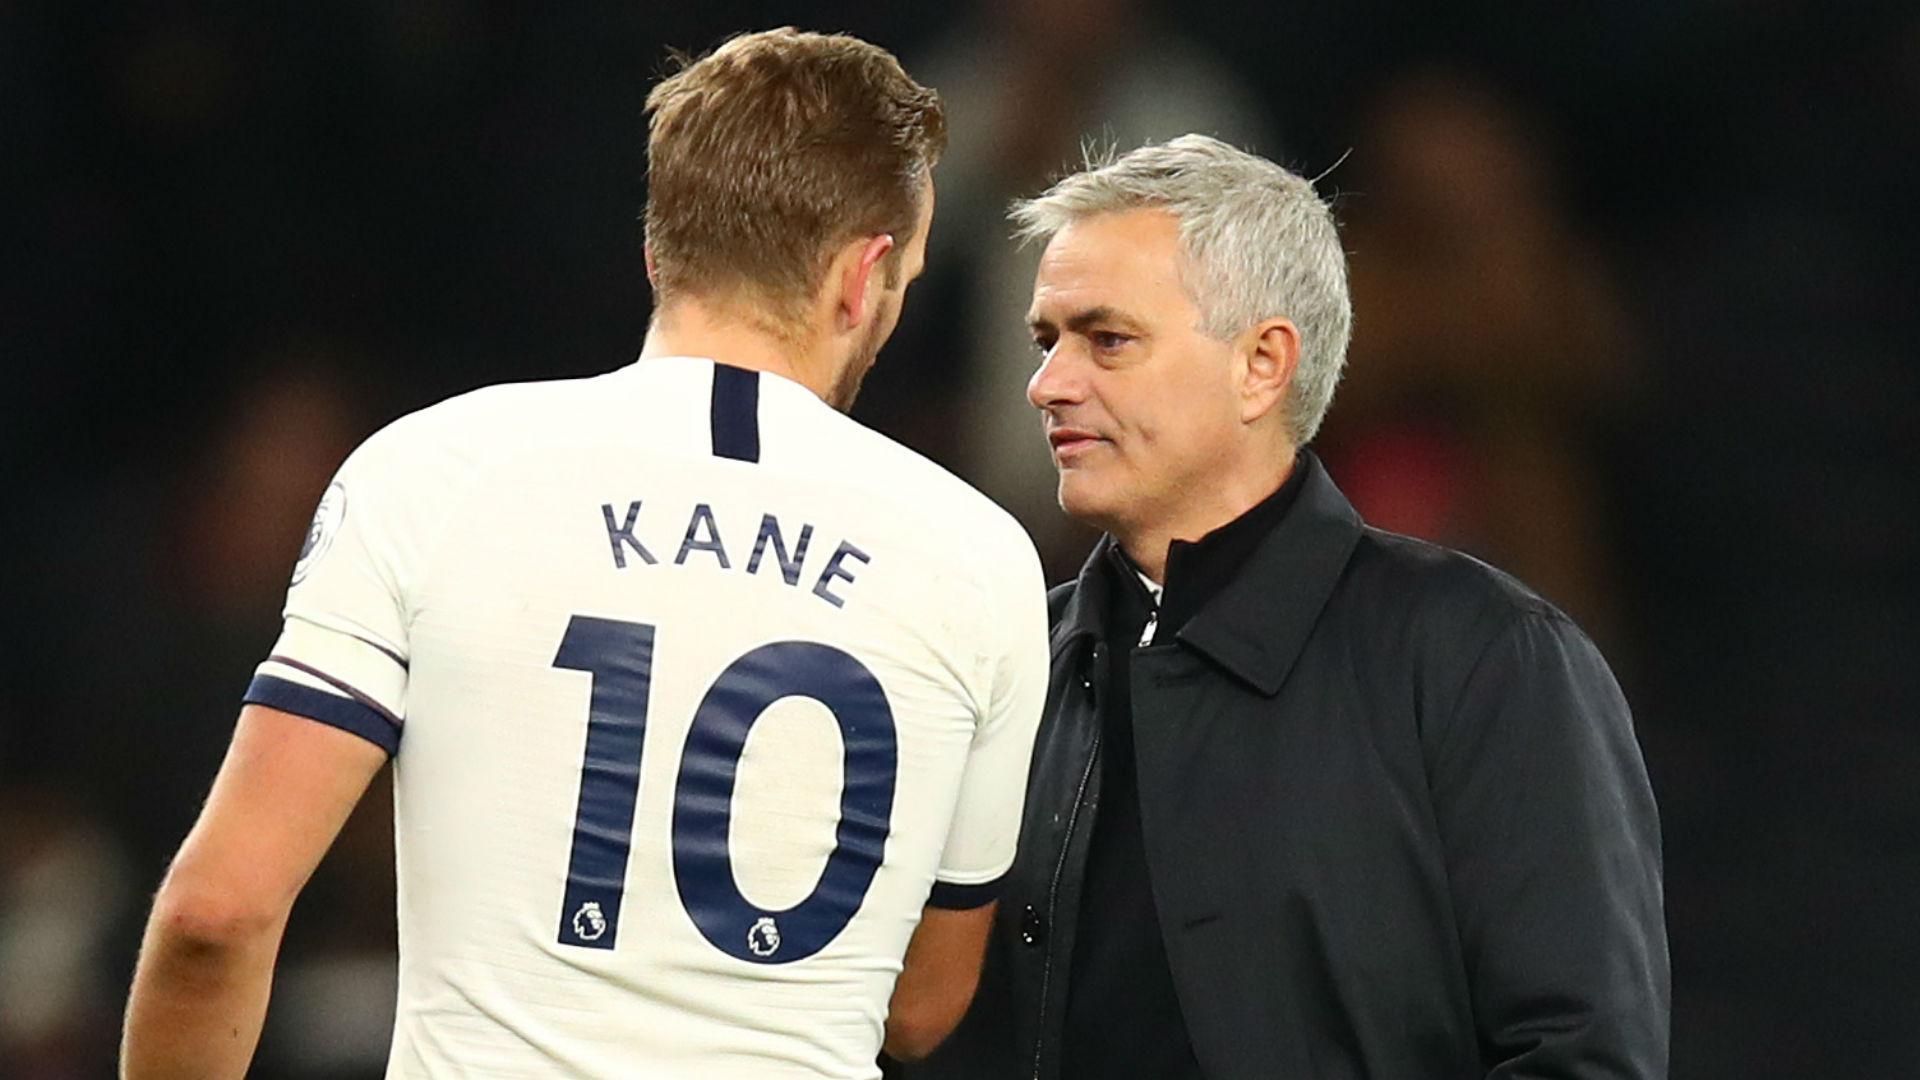 Van der Vaart hopes Kane remains with Mourinho at Tottenham